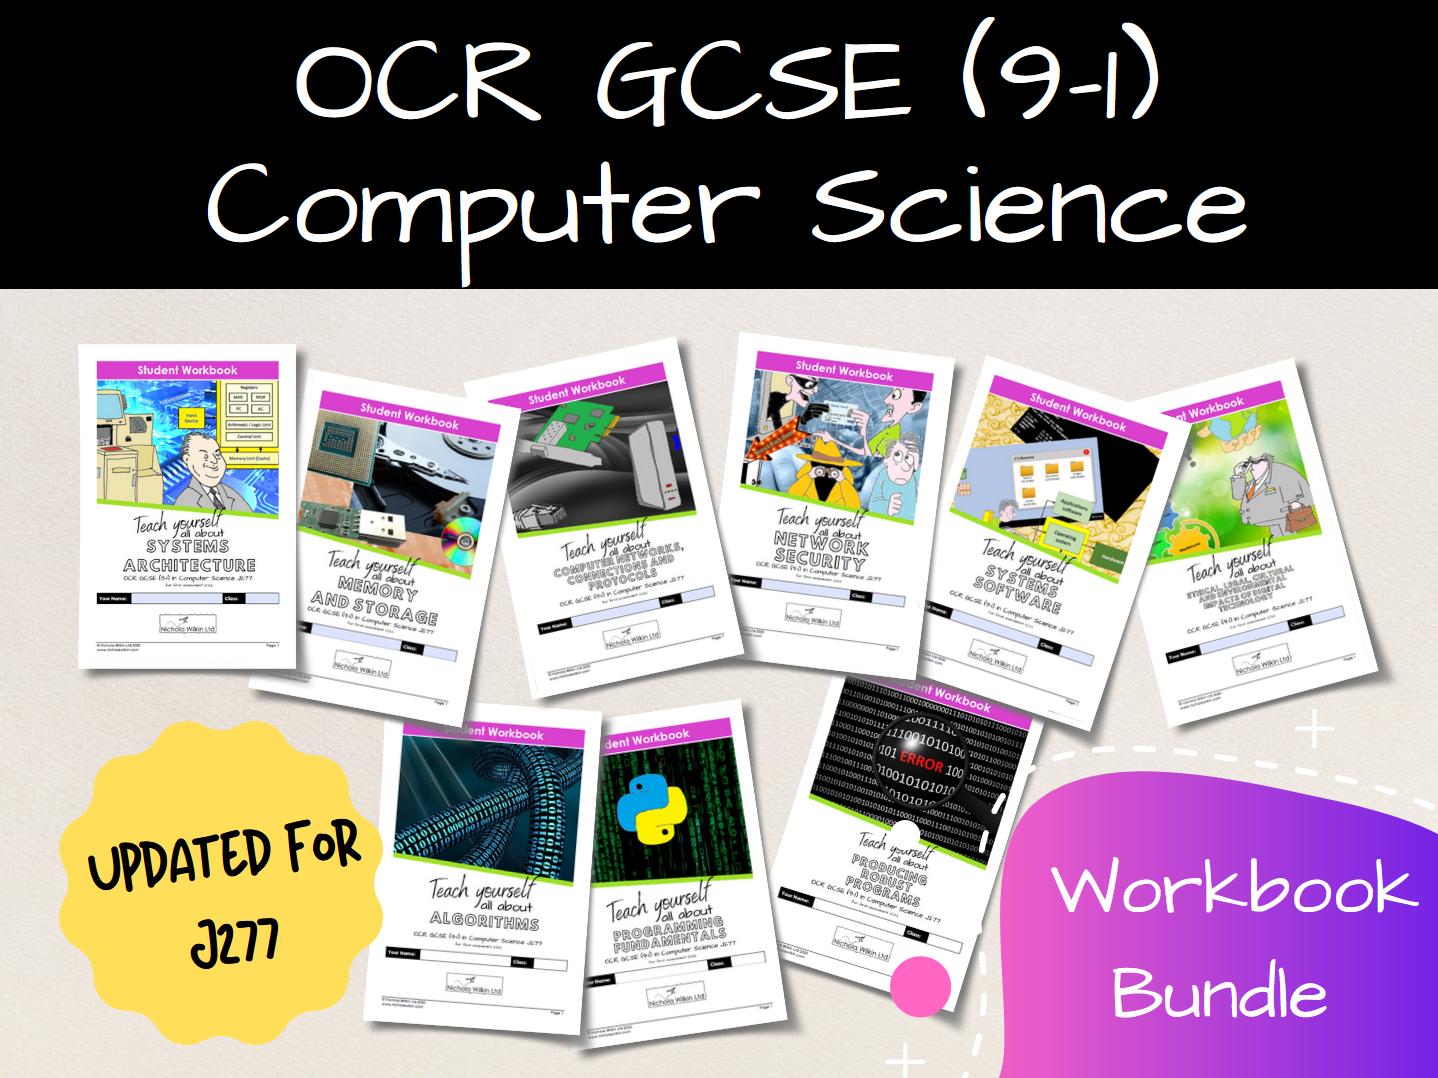 OCR GCSE (9-1) Computer Science J277 Workbooks